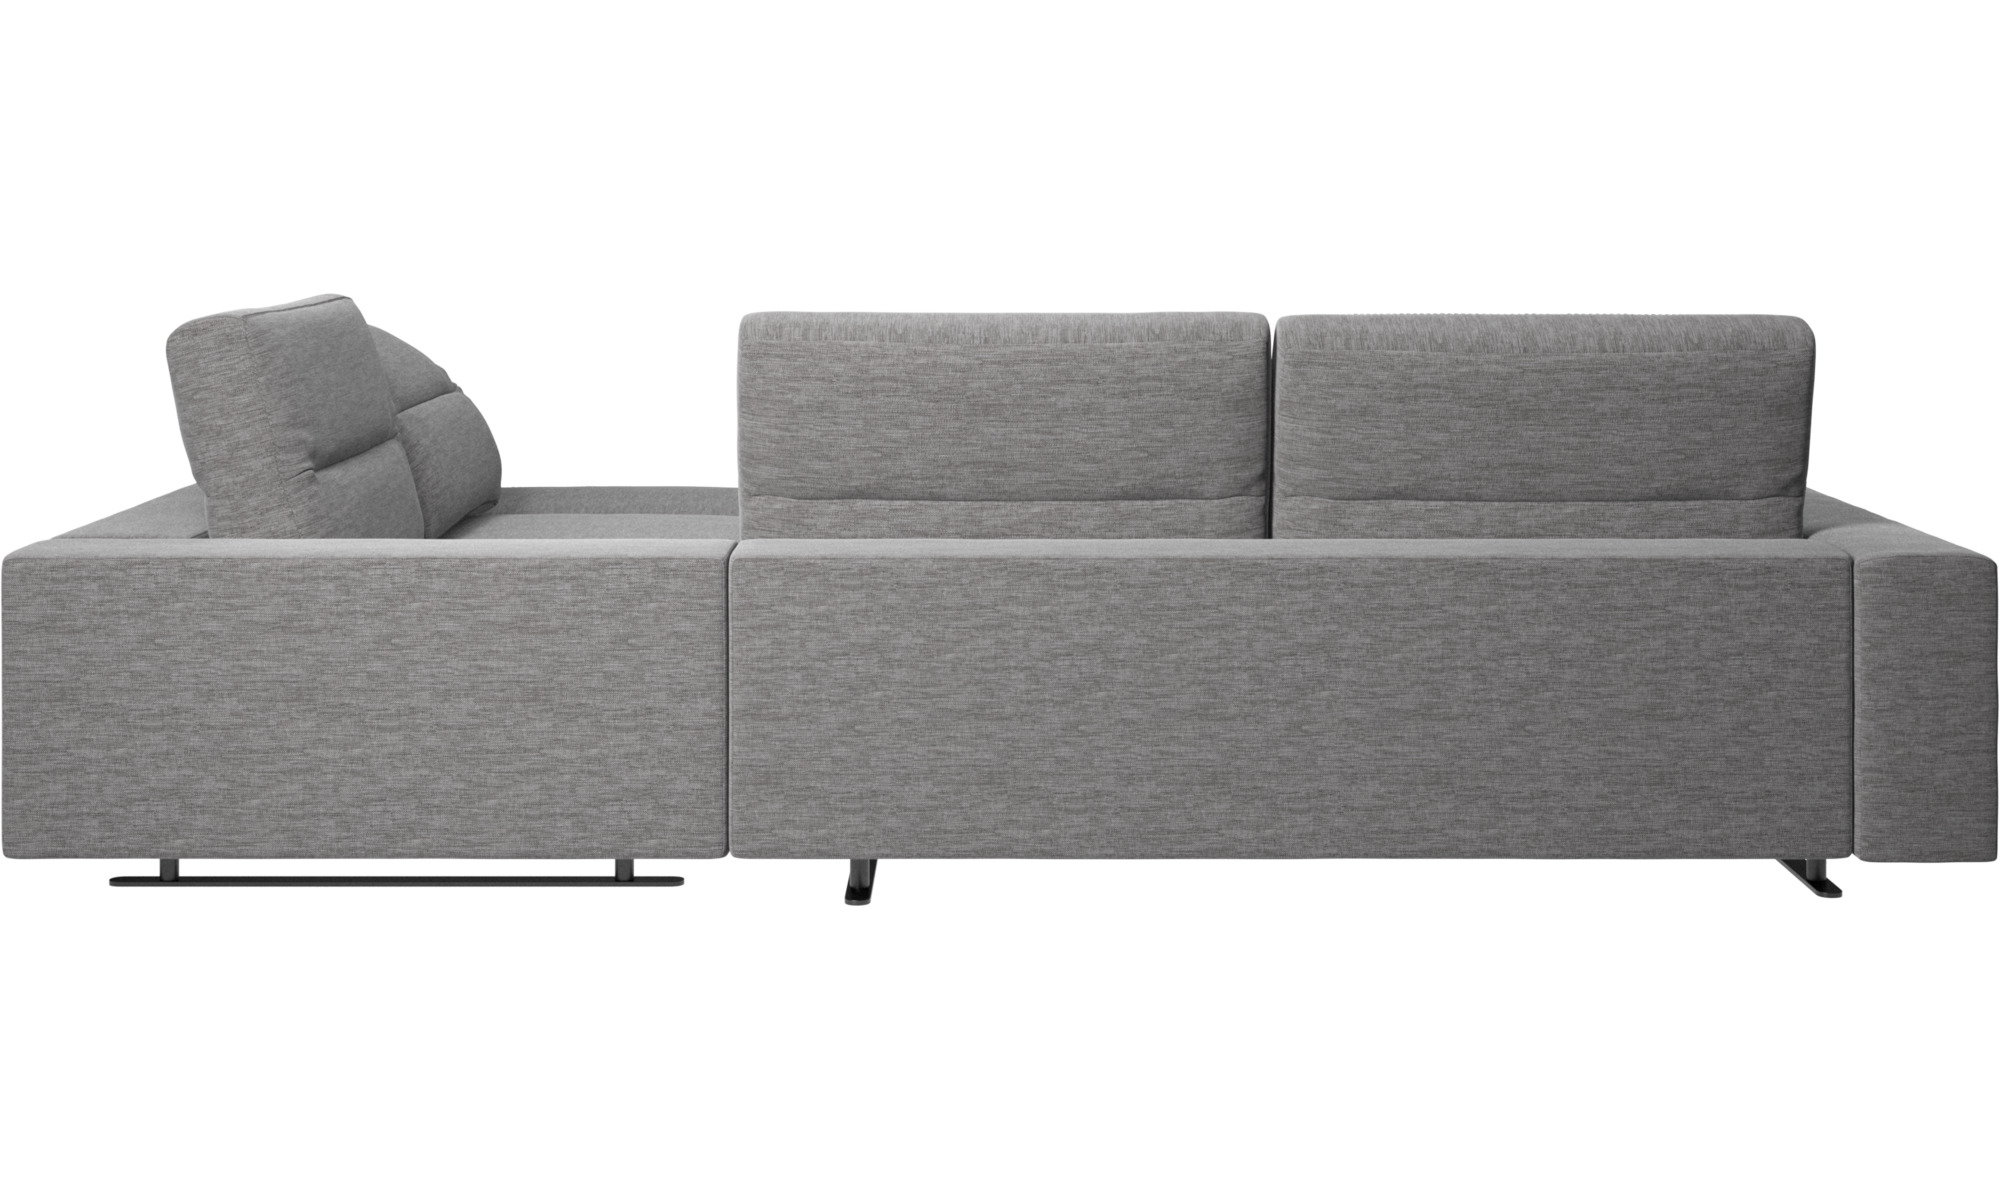 Corner Sofas Hampton Sofa With Adjule Back And Storage On Left Side Gray